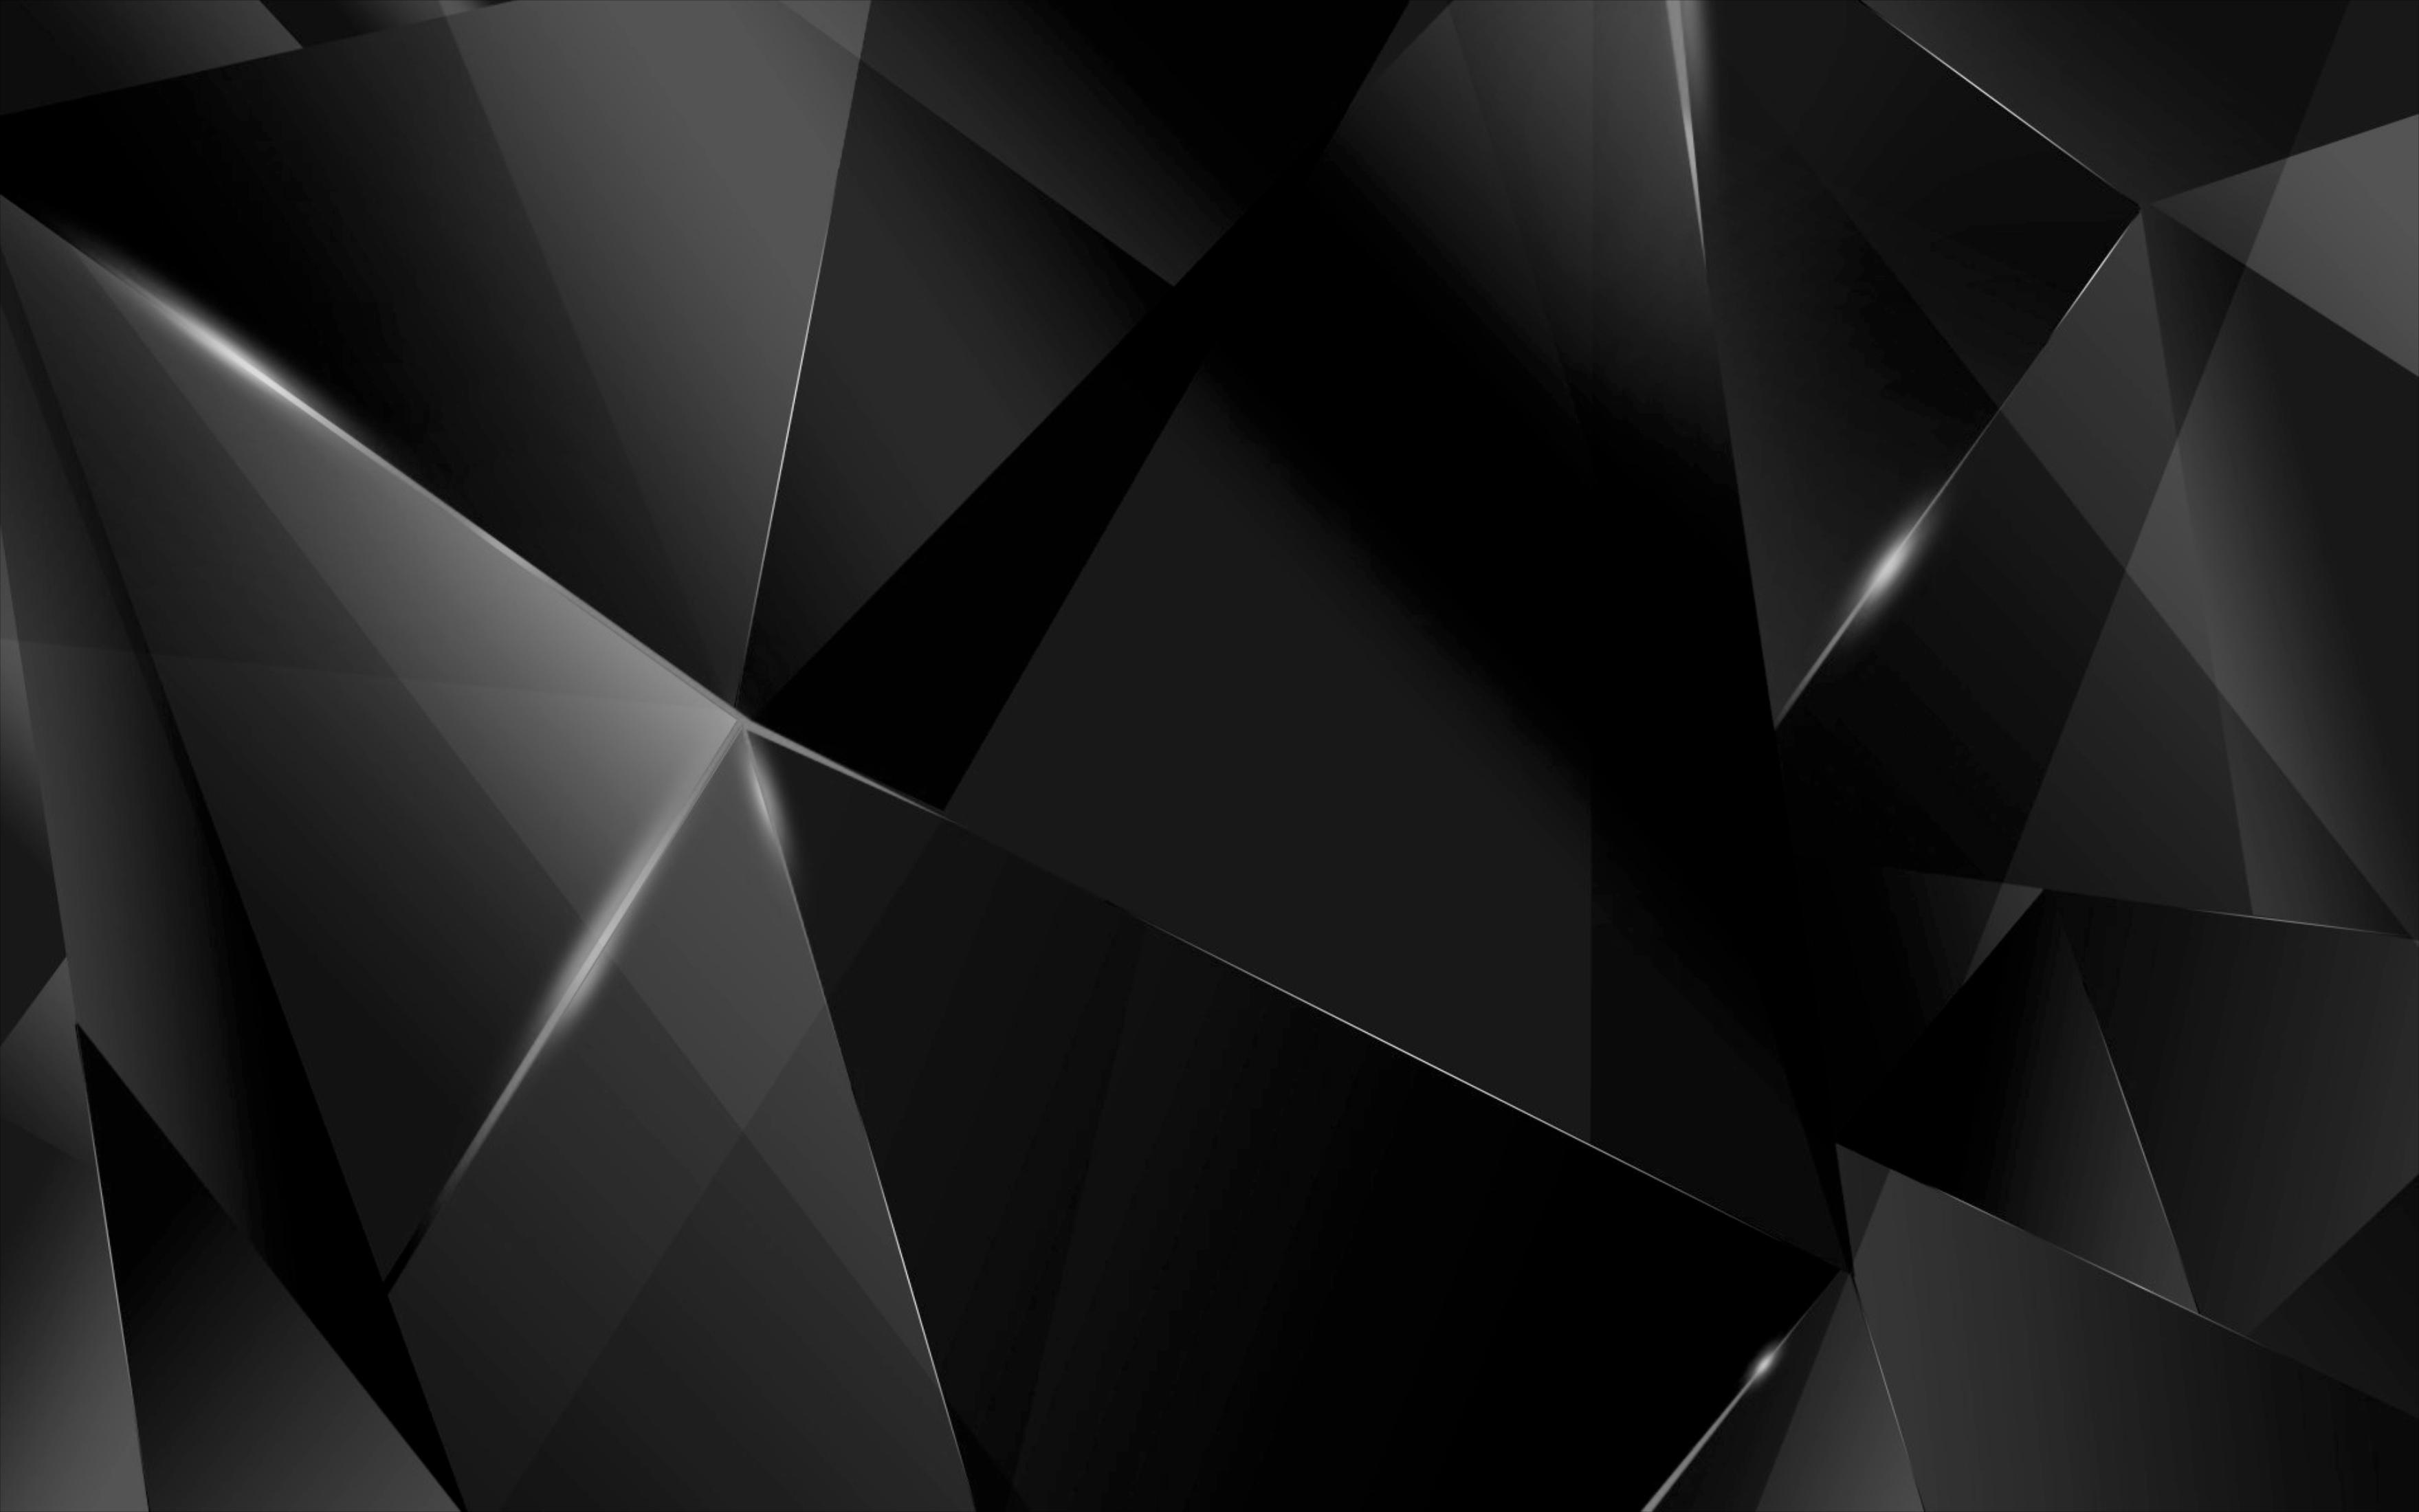 73+] Wallpapers Nexus on WallpaperSafari